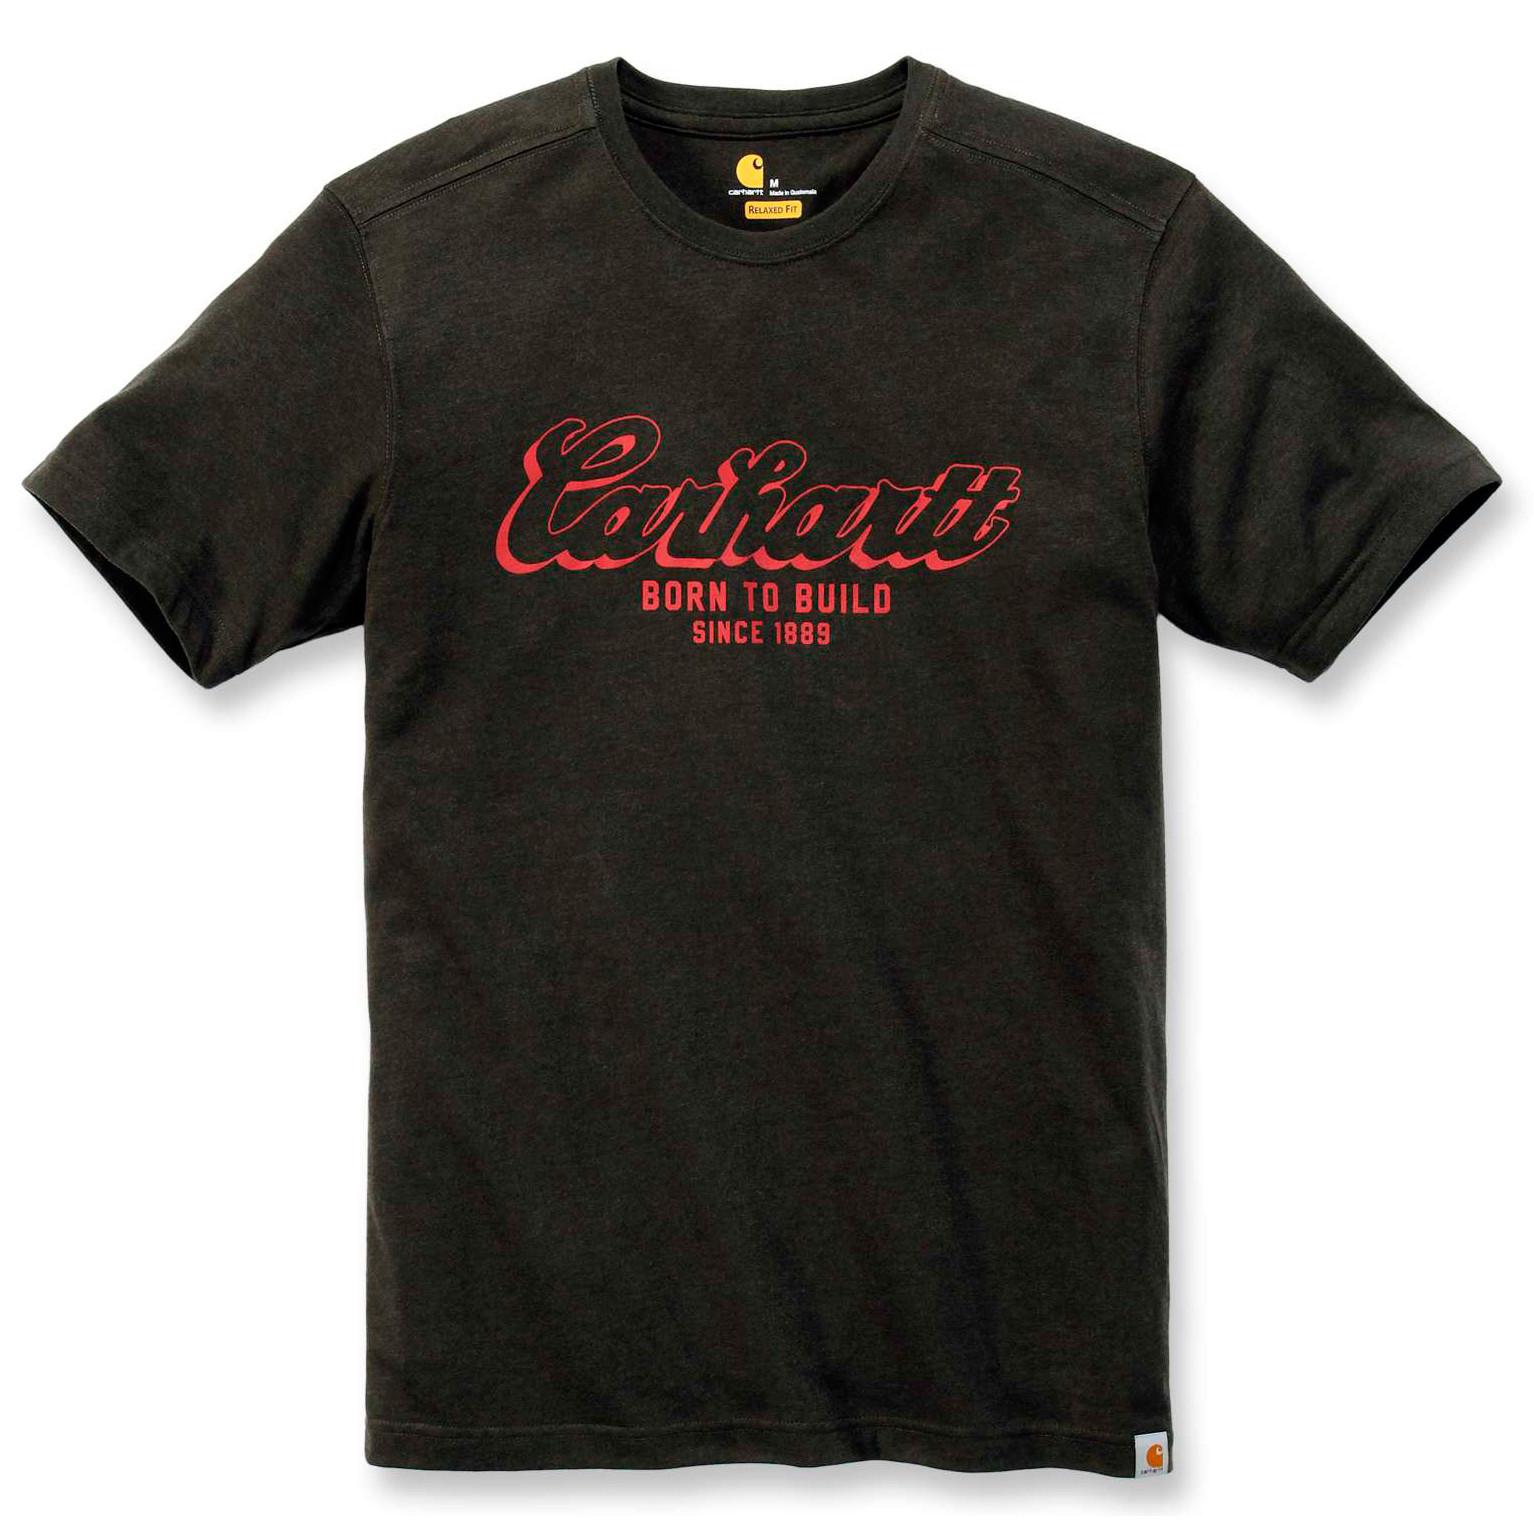 Футболка Carhartt Born To Build Graphic T-Shirt - 103563 (Peat Heather, S)